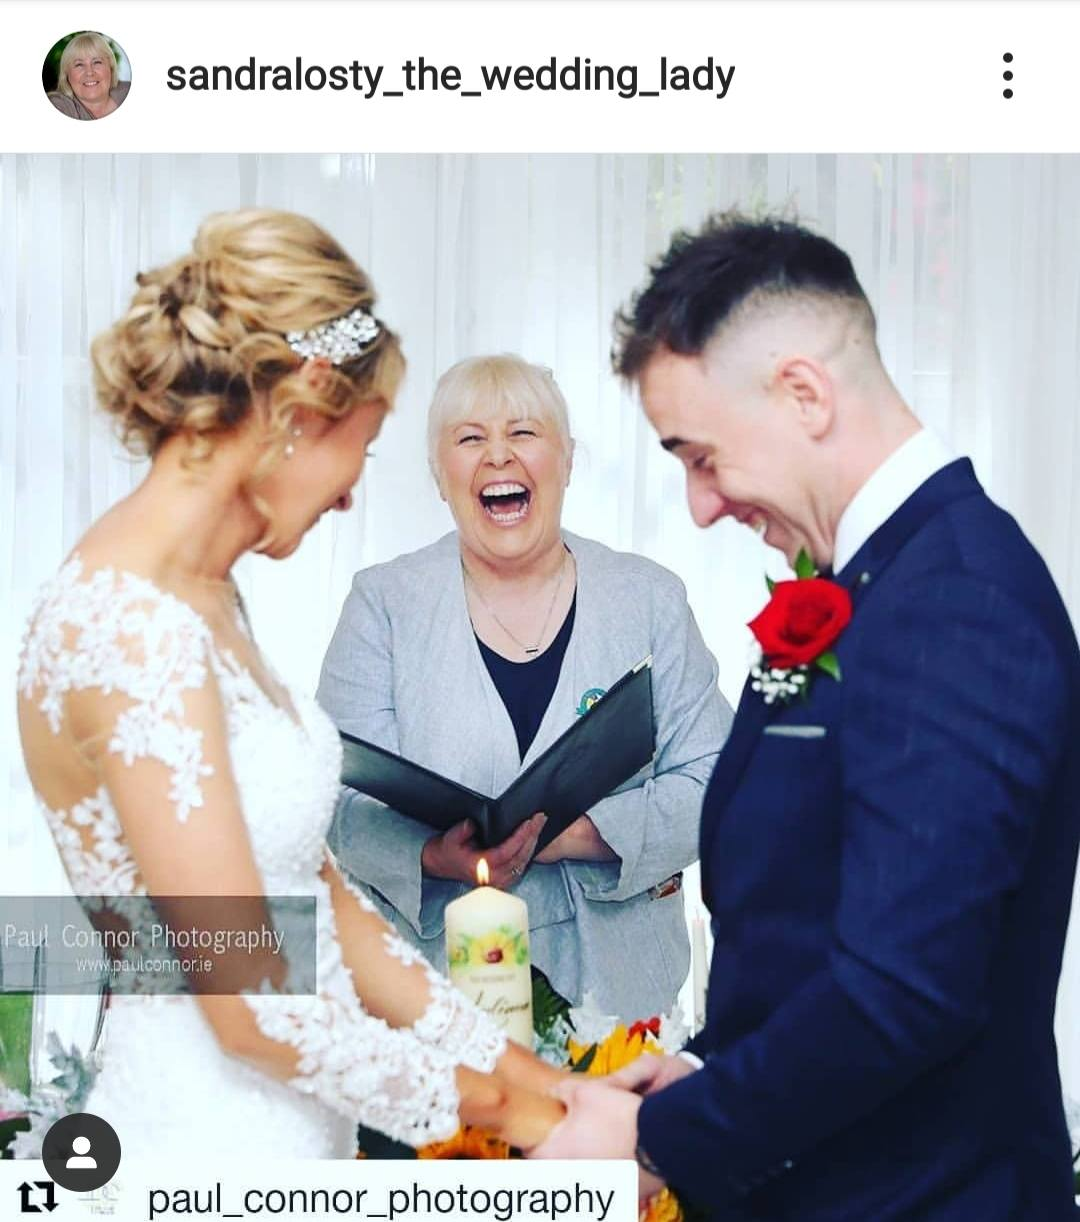 sandra-losty-wedding-officiant-BBPTVShow-guest